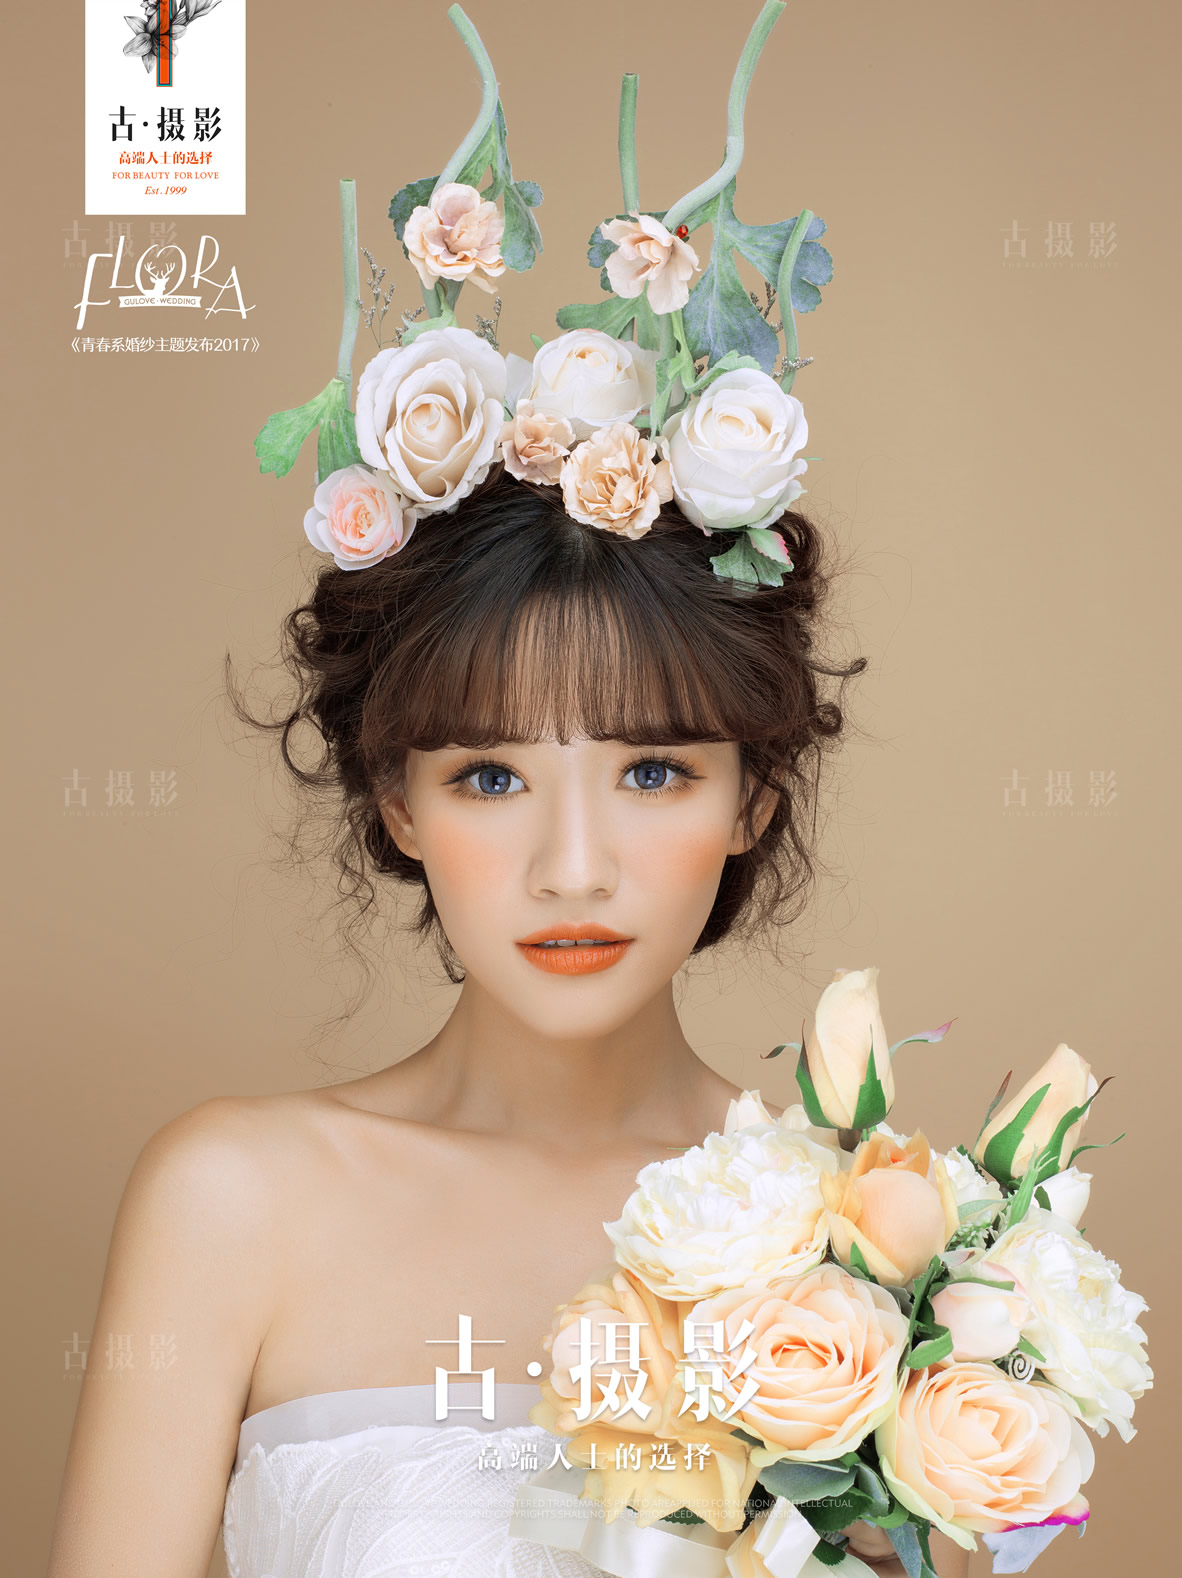 flowers Ⅲ - 明星范 - 广州婚纱摄影-广州古摄影官网